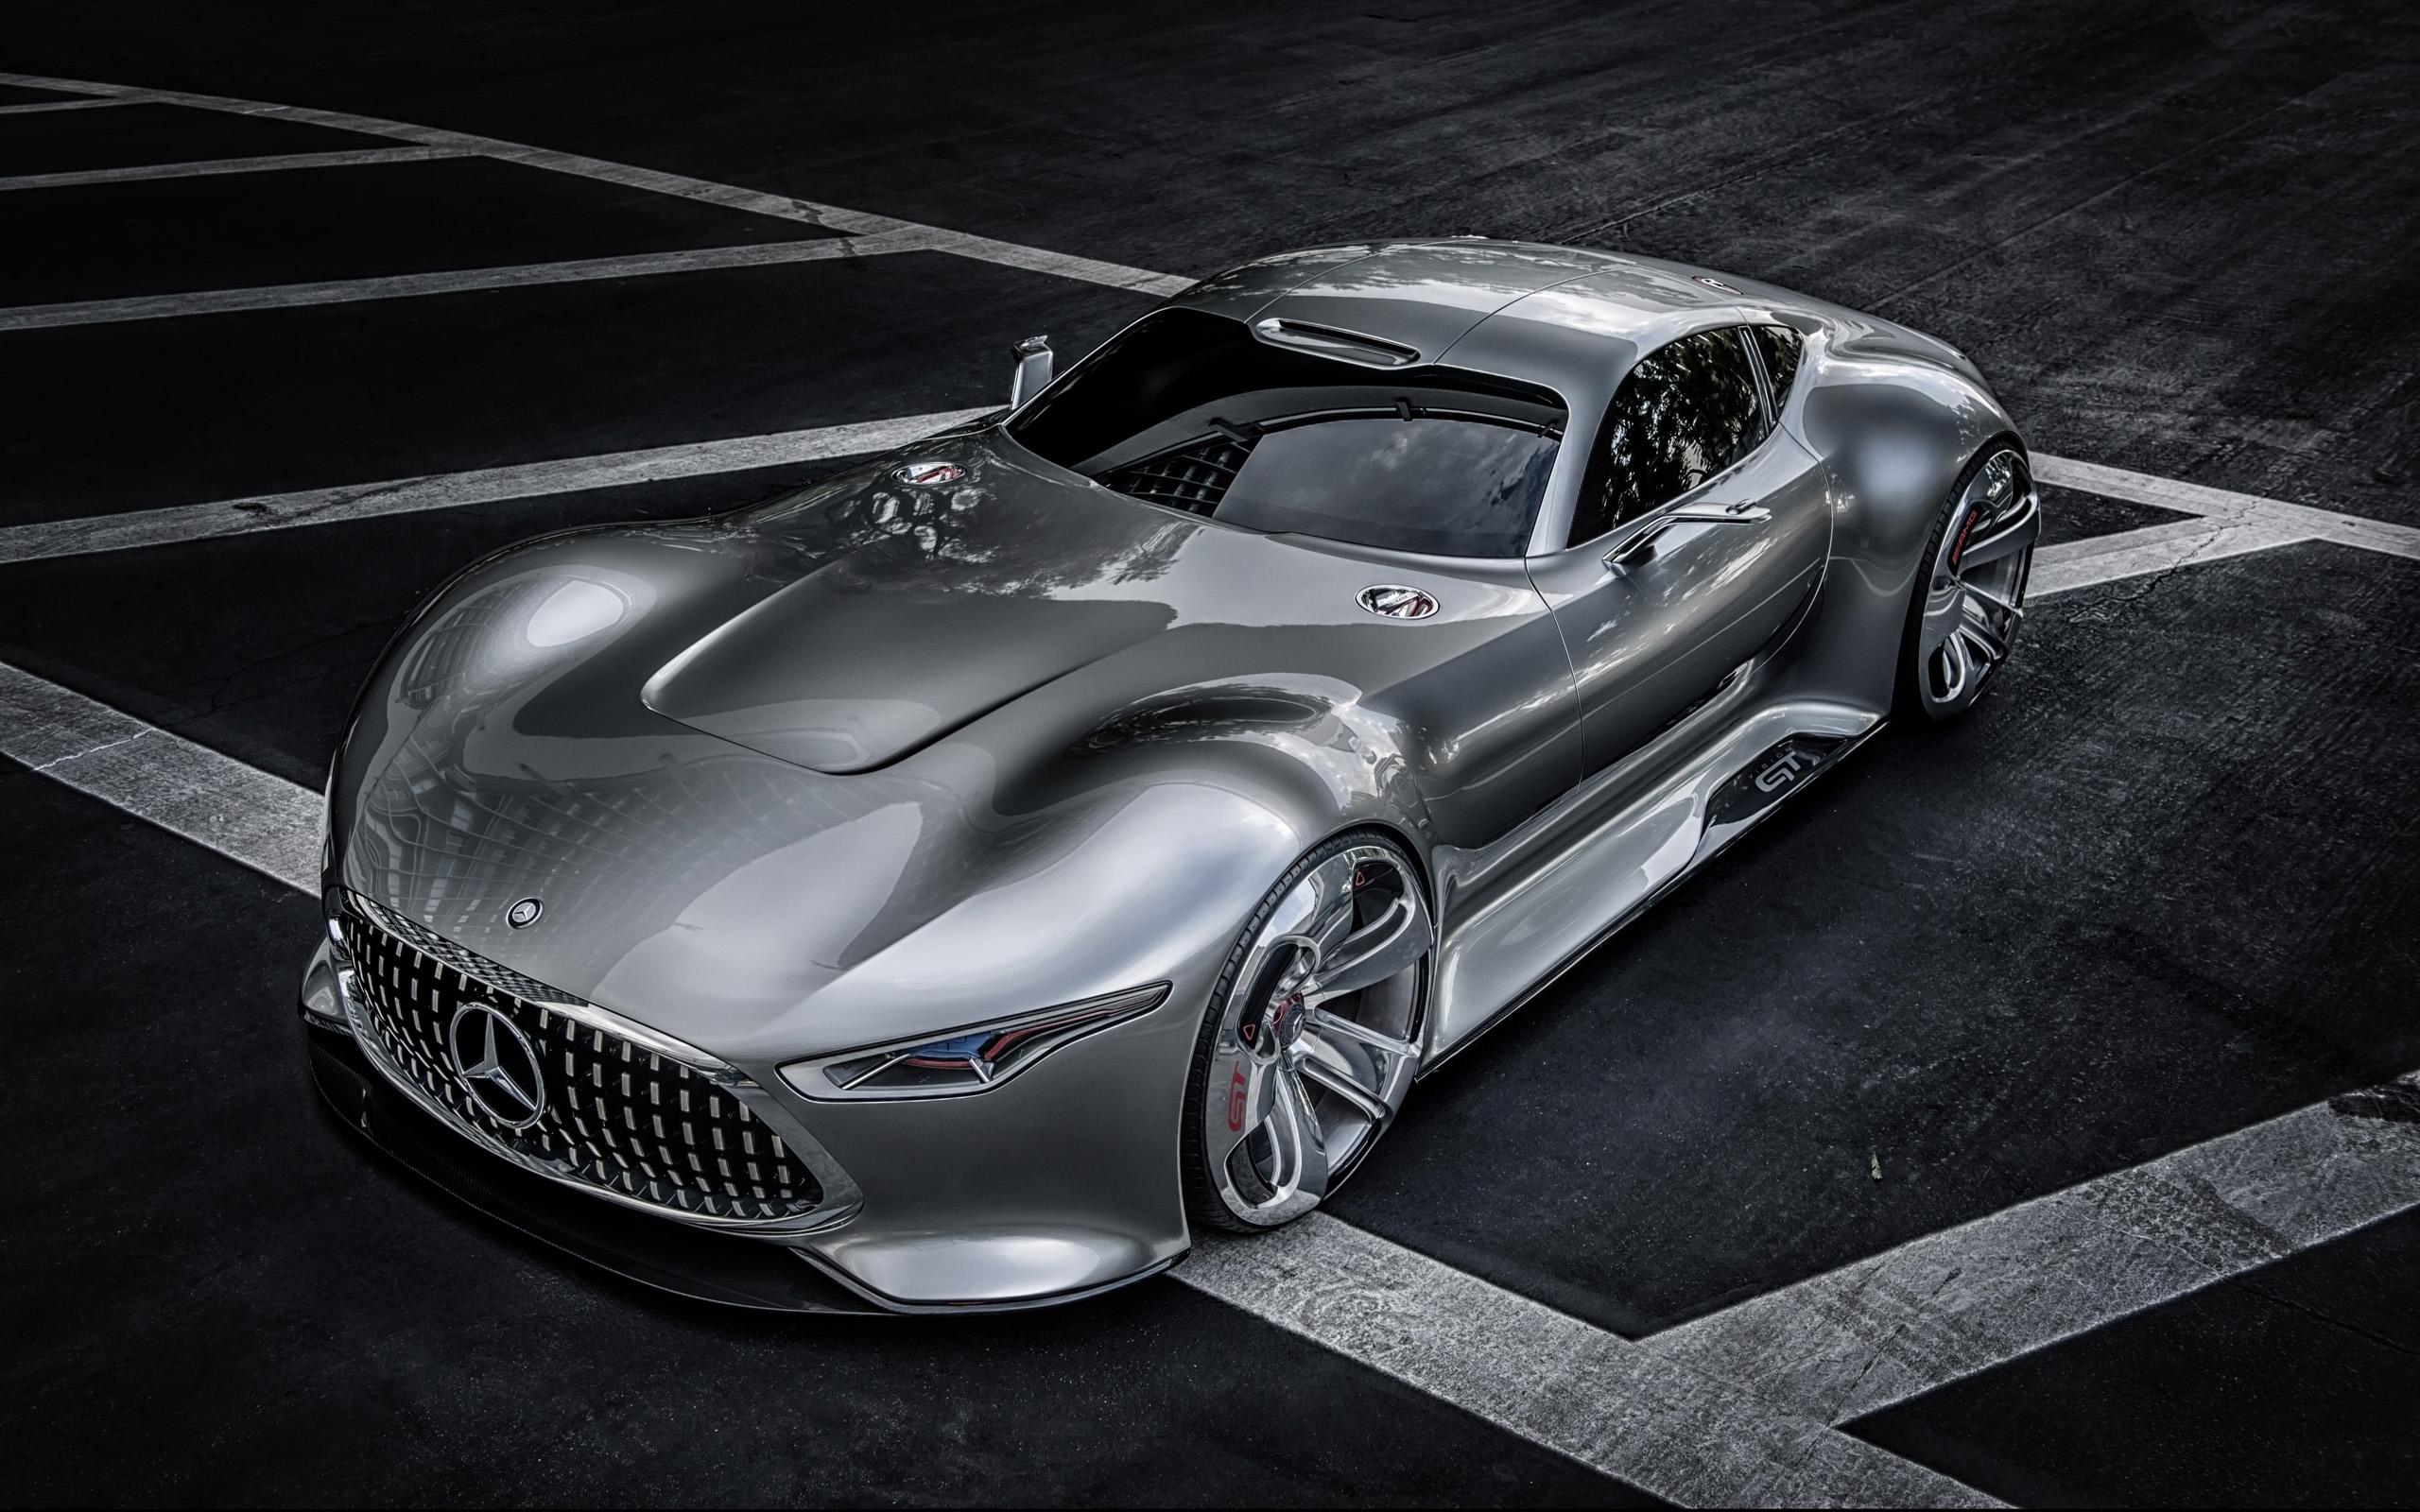 2013 Mercedes Benz AMG Vision Gran Turismo 2 Wallpaper ...